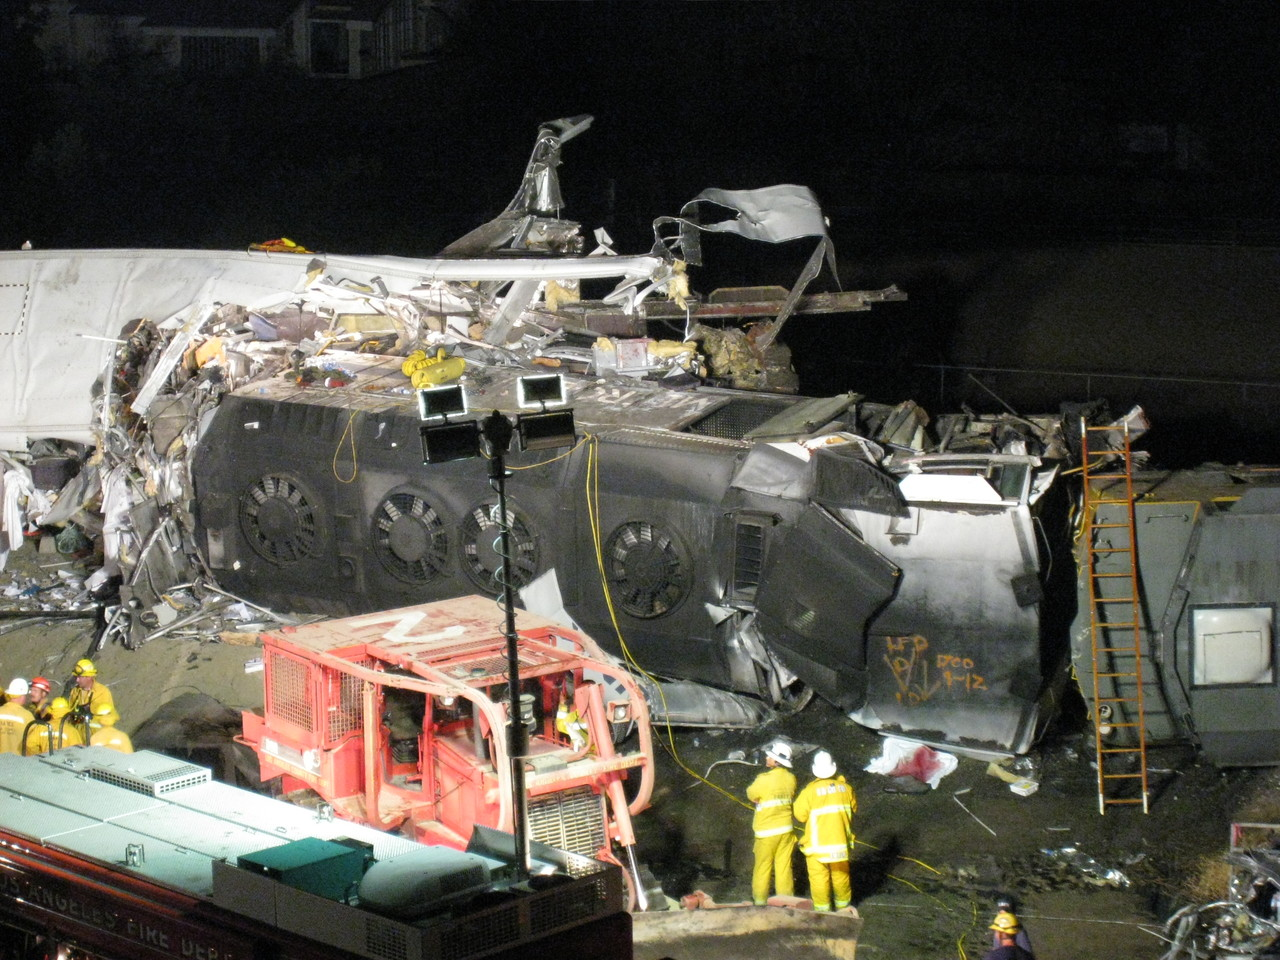 2008 Chatsworth train collision - Wikipedia